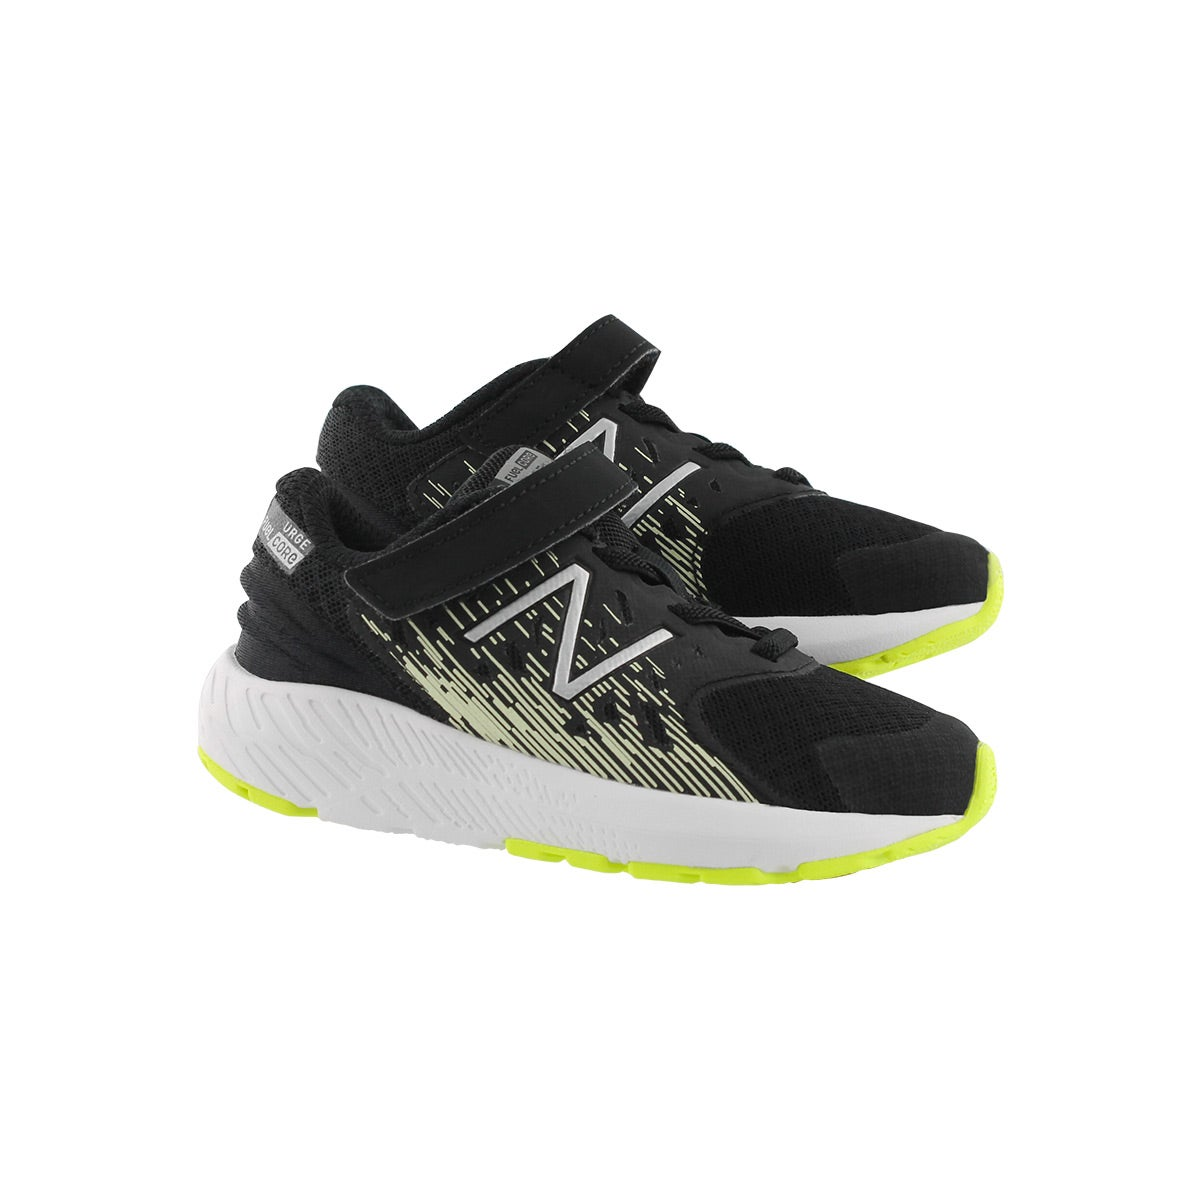 Infs-b Urge ice black/glow sneaker